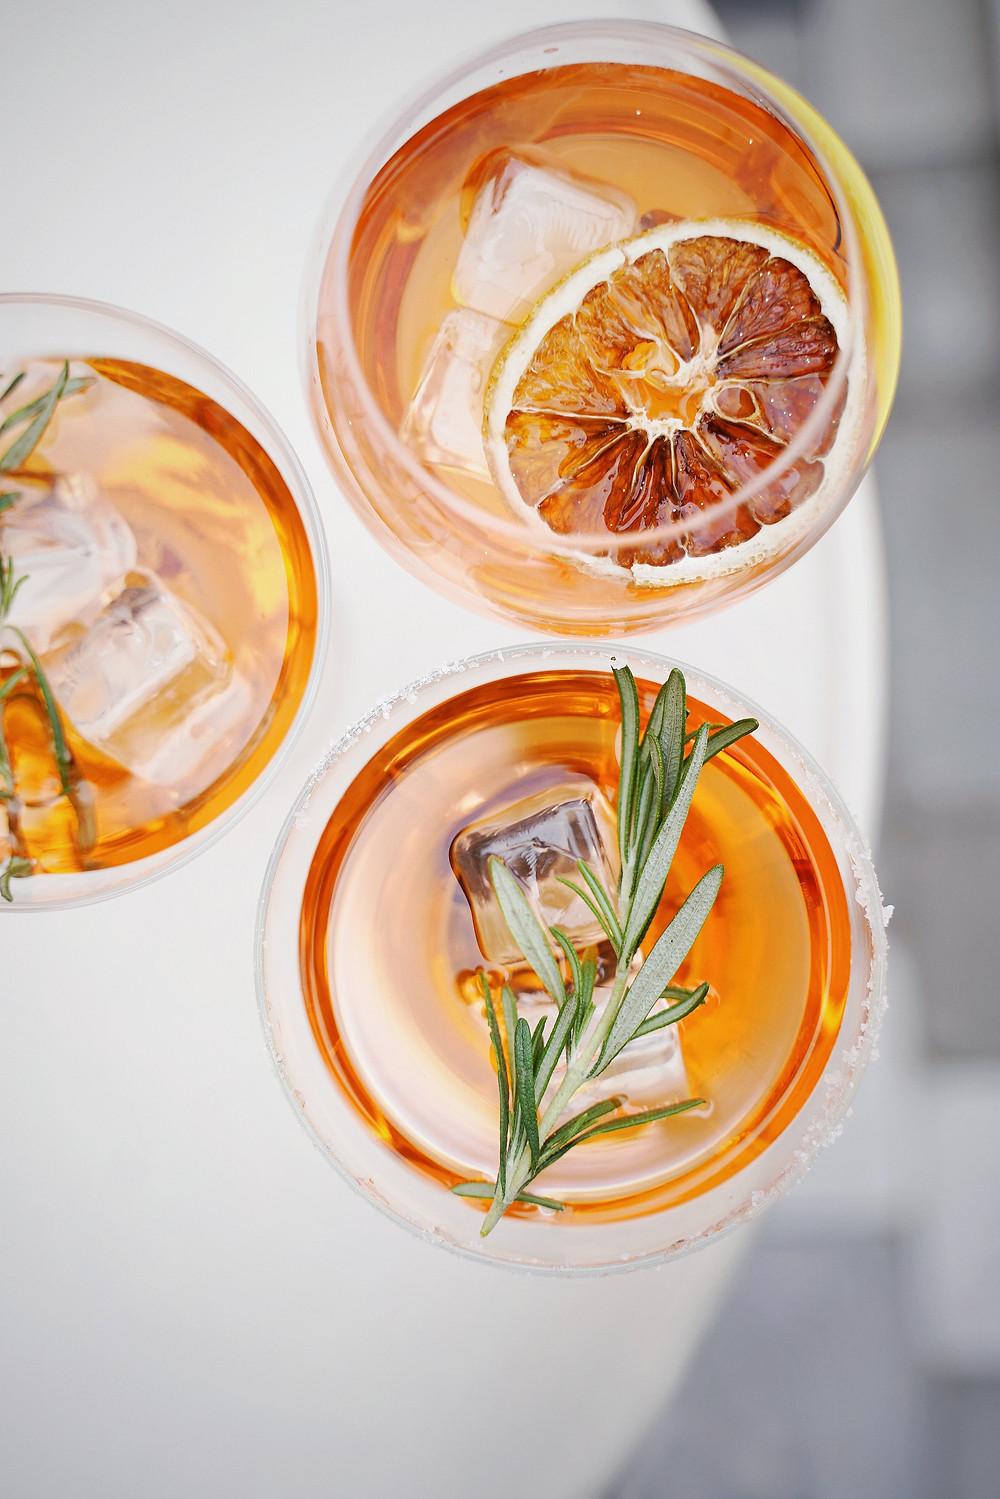 DIY Cocktails to make during lockdown